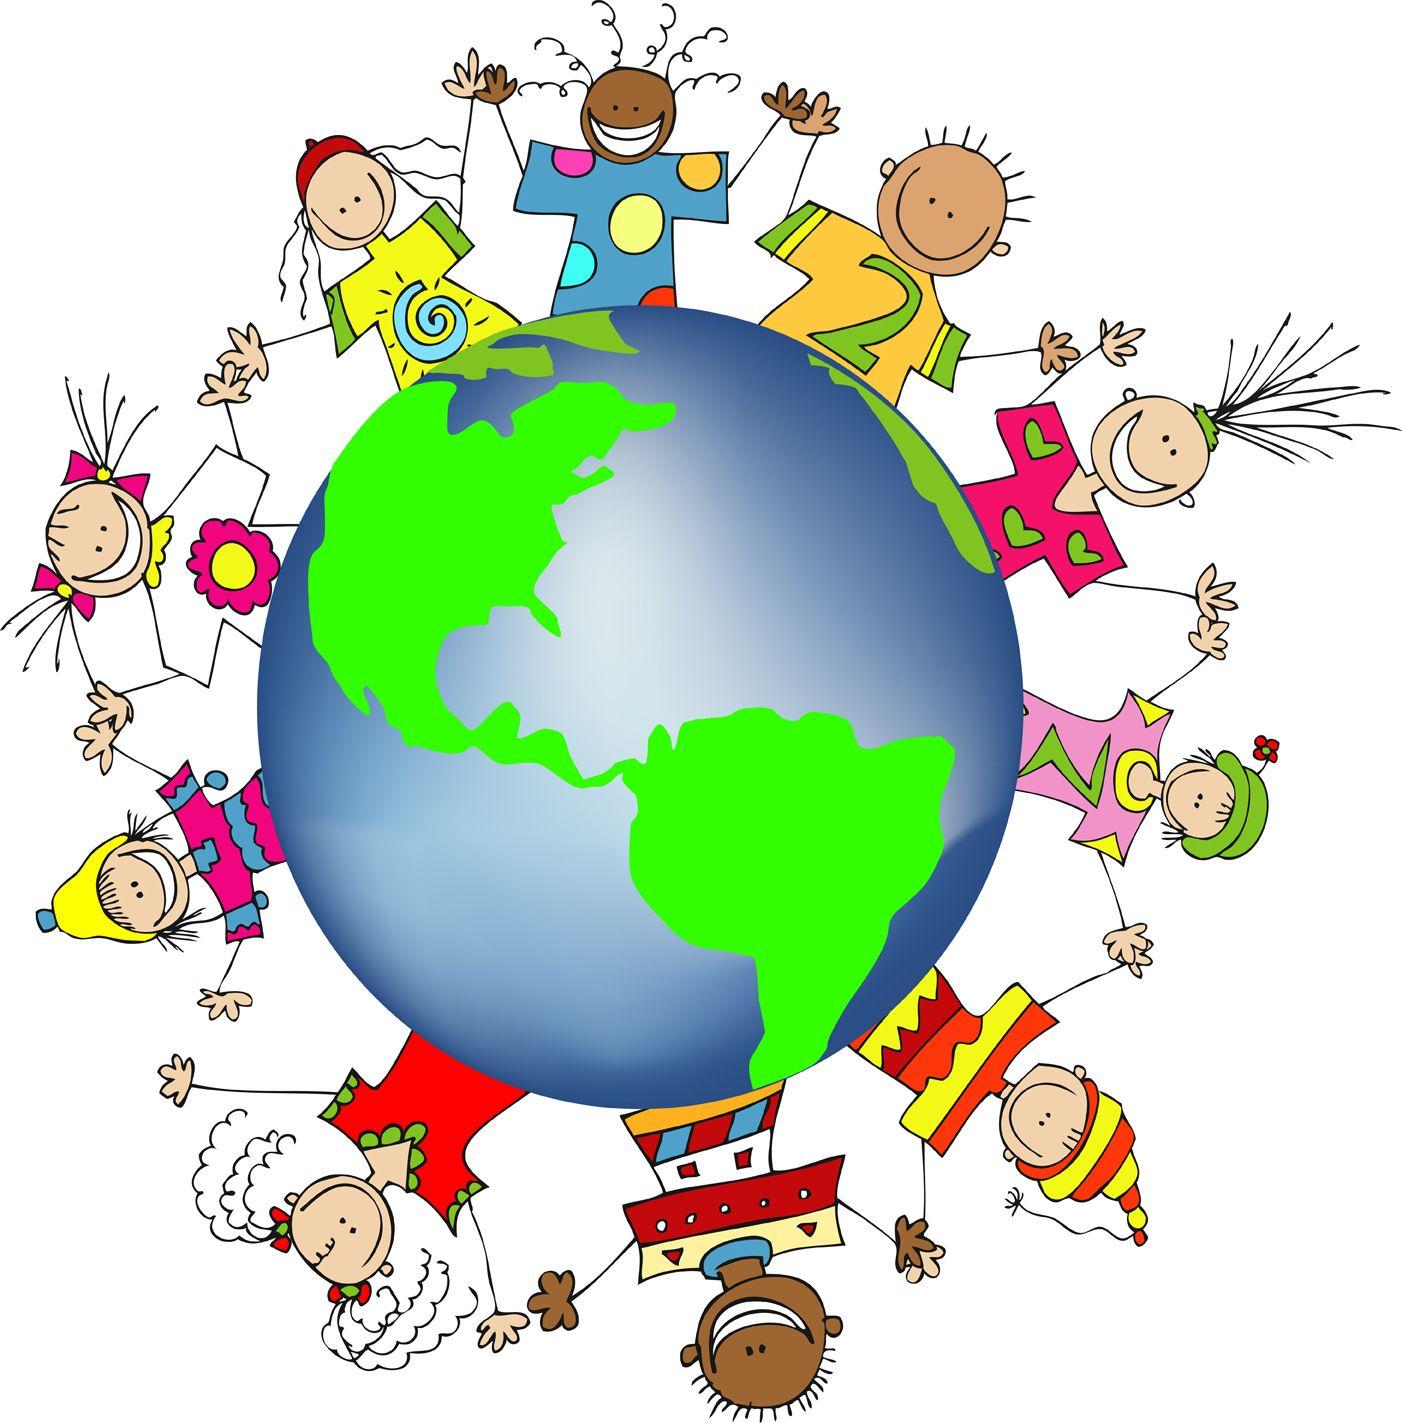 kids world hands friends networks globe illustration small free  [ 1402 x 1423 Pixel ]